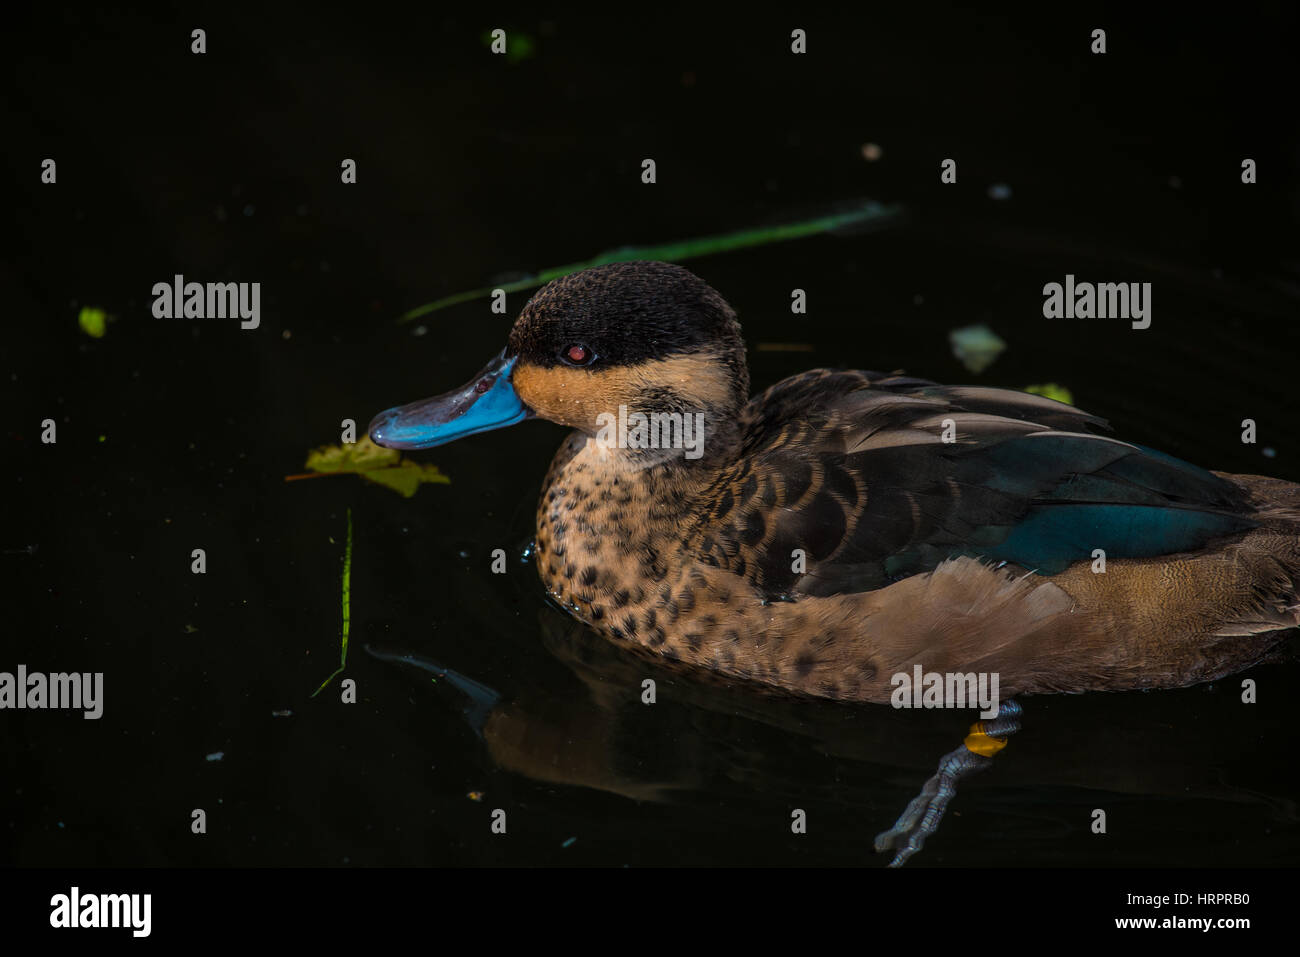 Facturó azul tela flotando sobre el agua Imagen De Stock